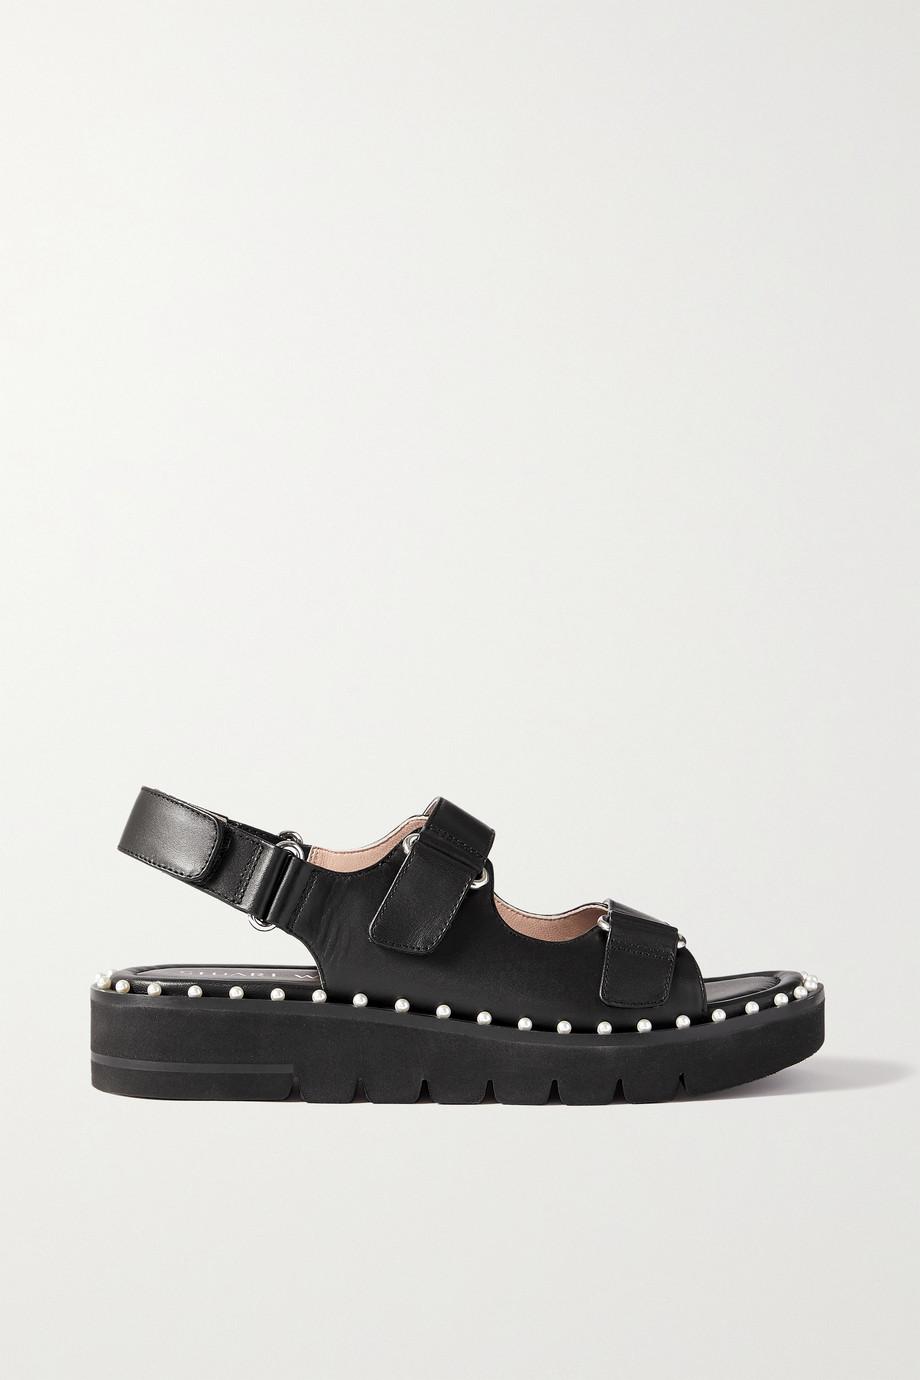 Stuart Weitzman Zoe faux pearl-embellished leather slingback sandals